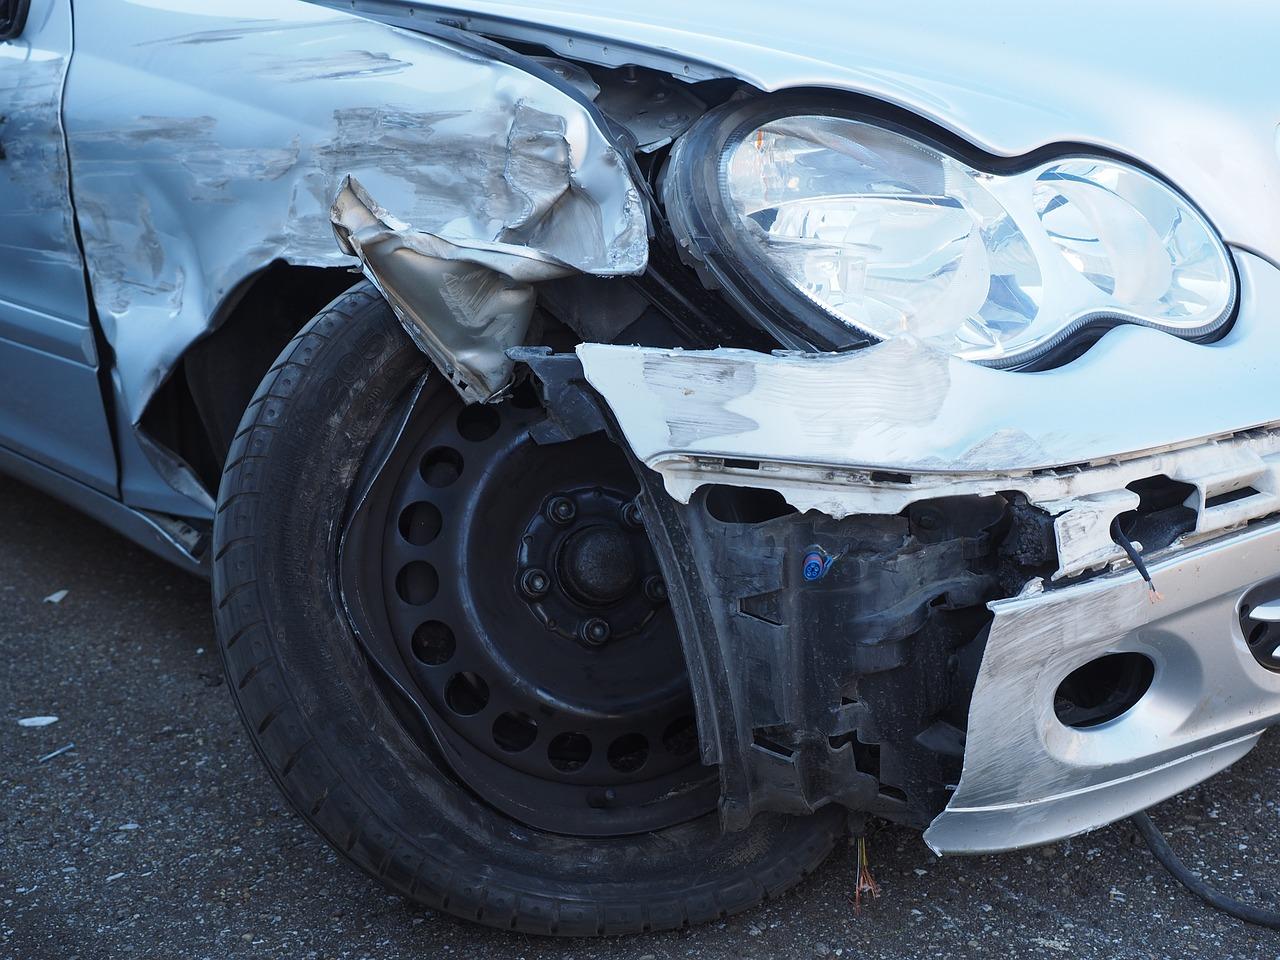 overdreven snelheid, snelheidsovertreding, auto-ongeluk, auto-ongeval, Boetecalculator